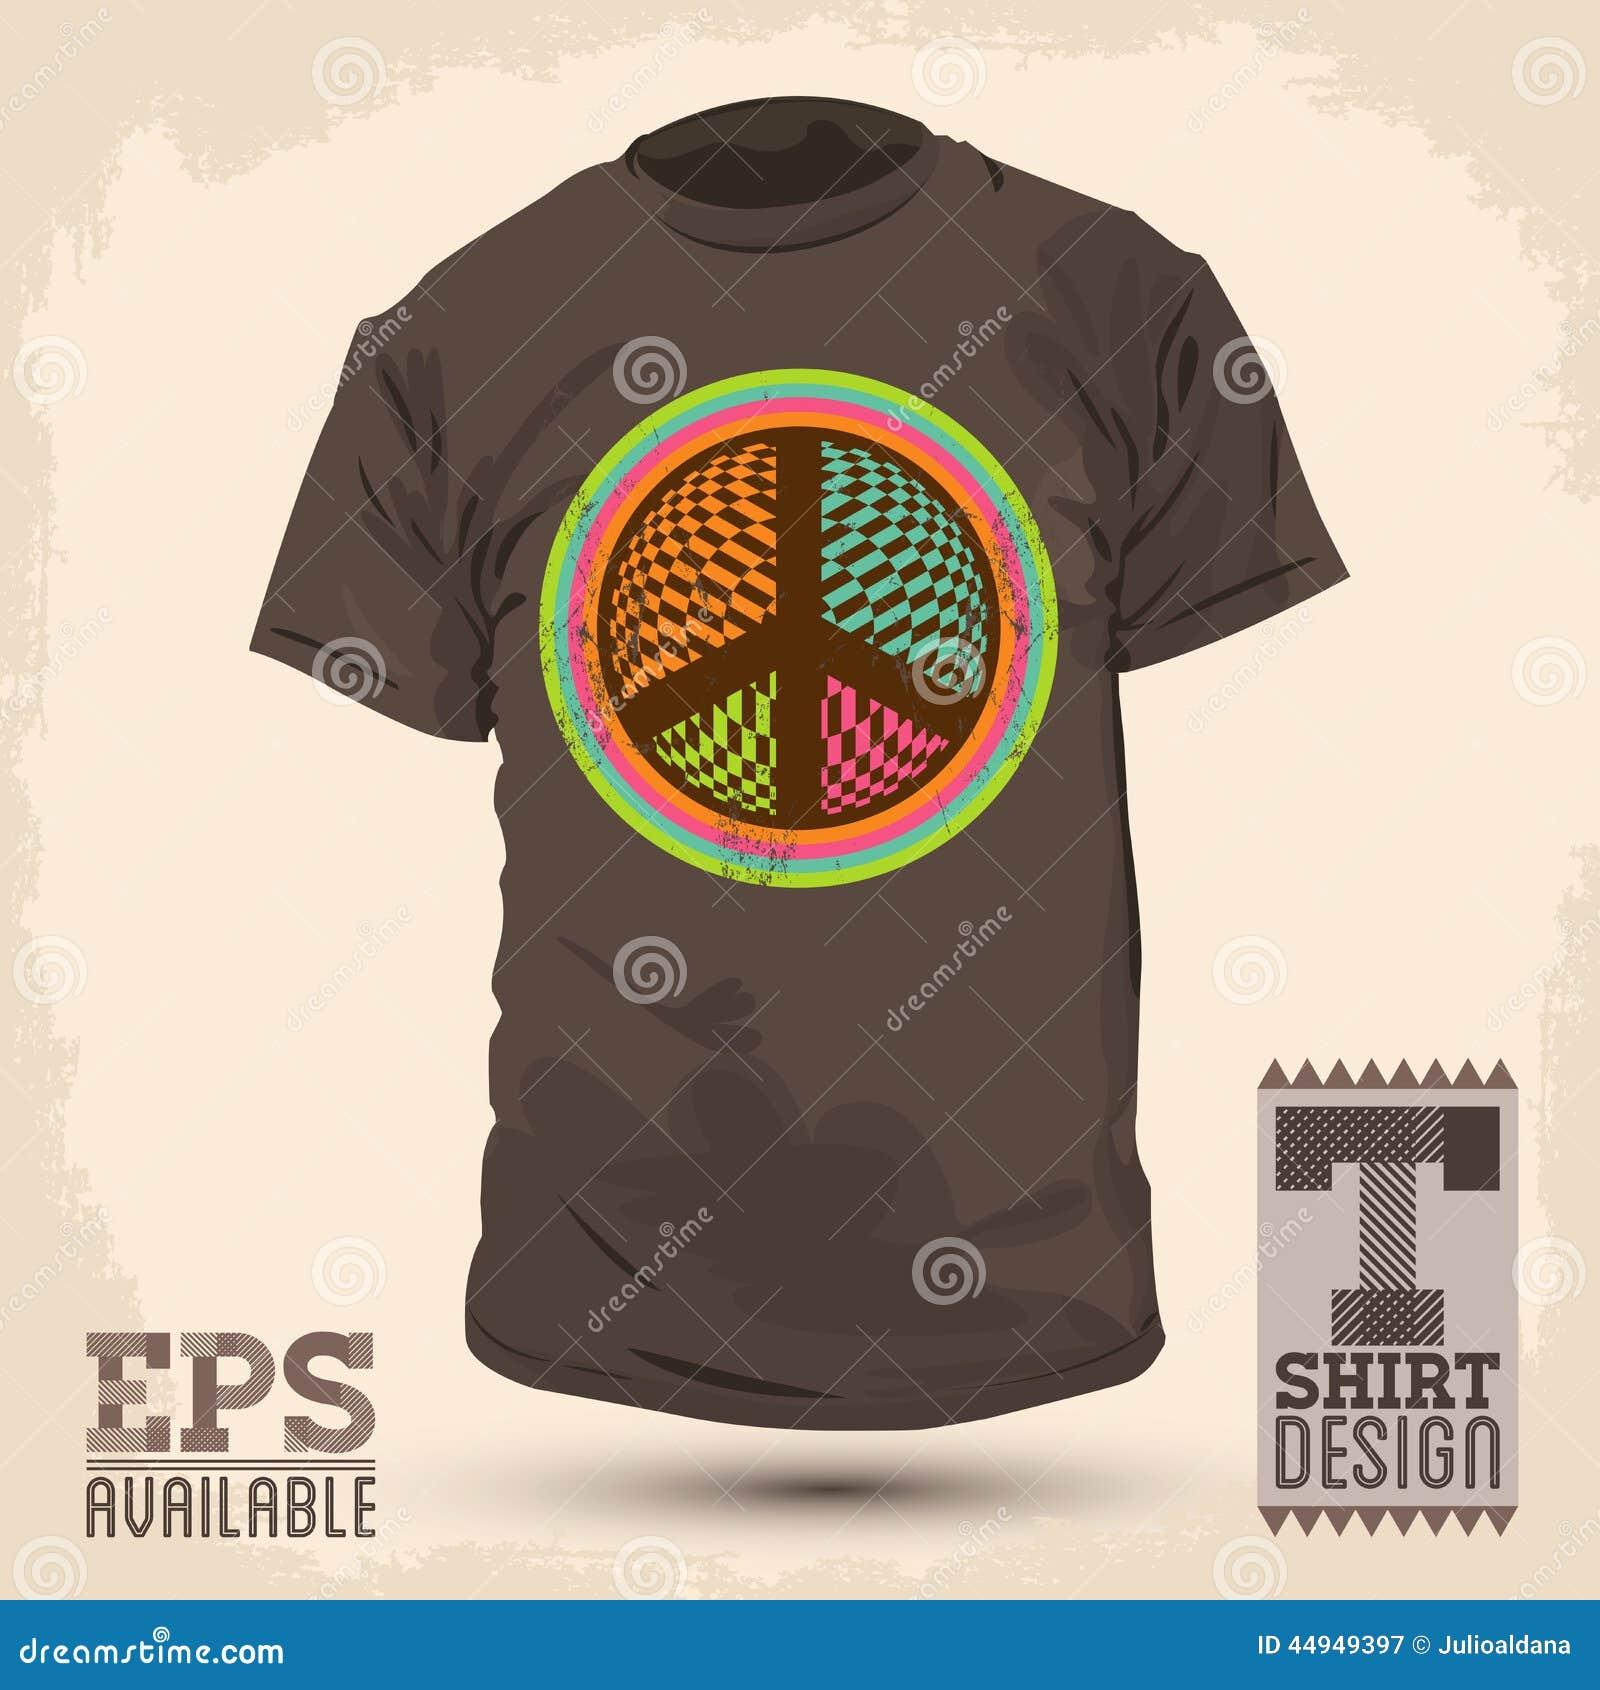 Shirt design elements - Vintage Graphic T Shirt Design Peace And Love Sign